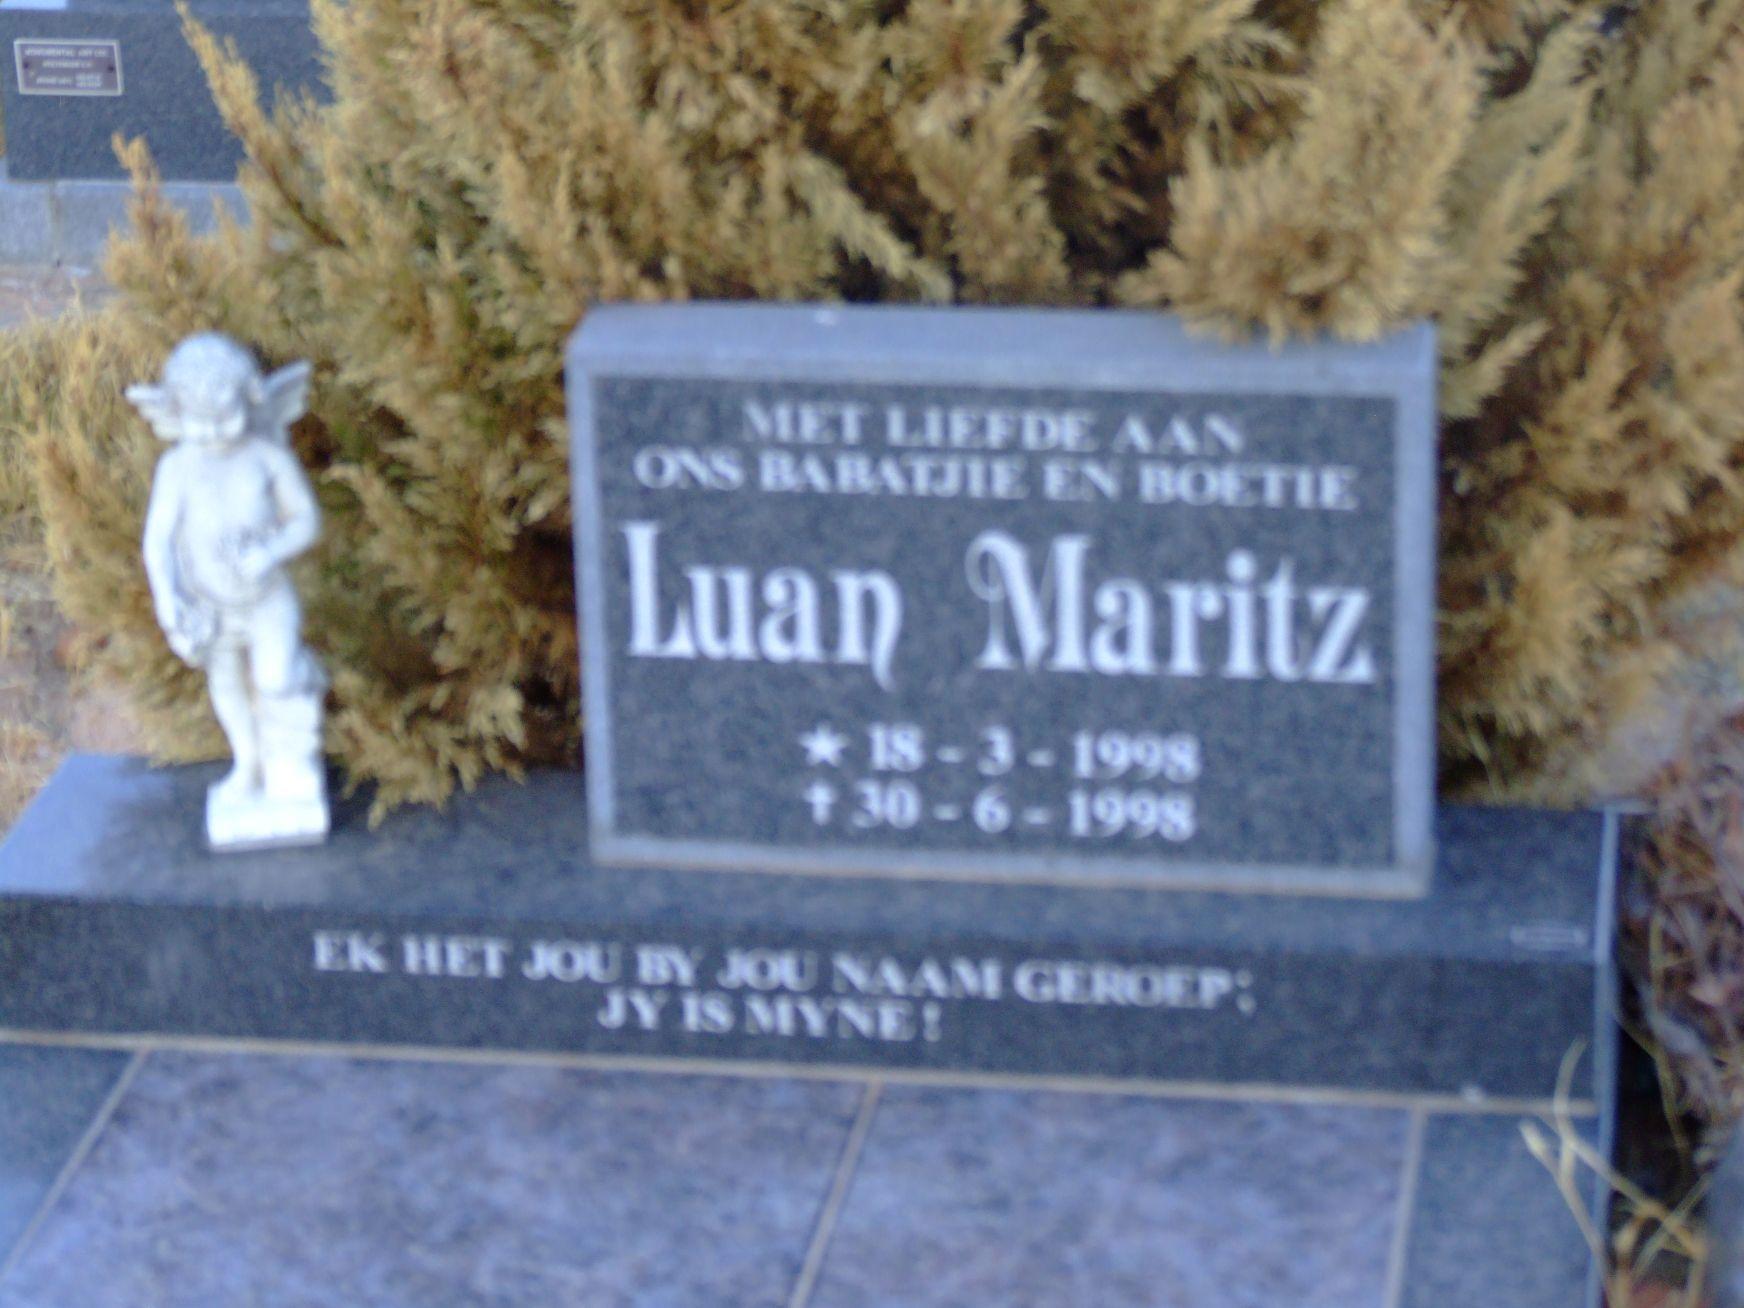 Maritz, Luan